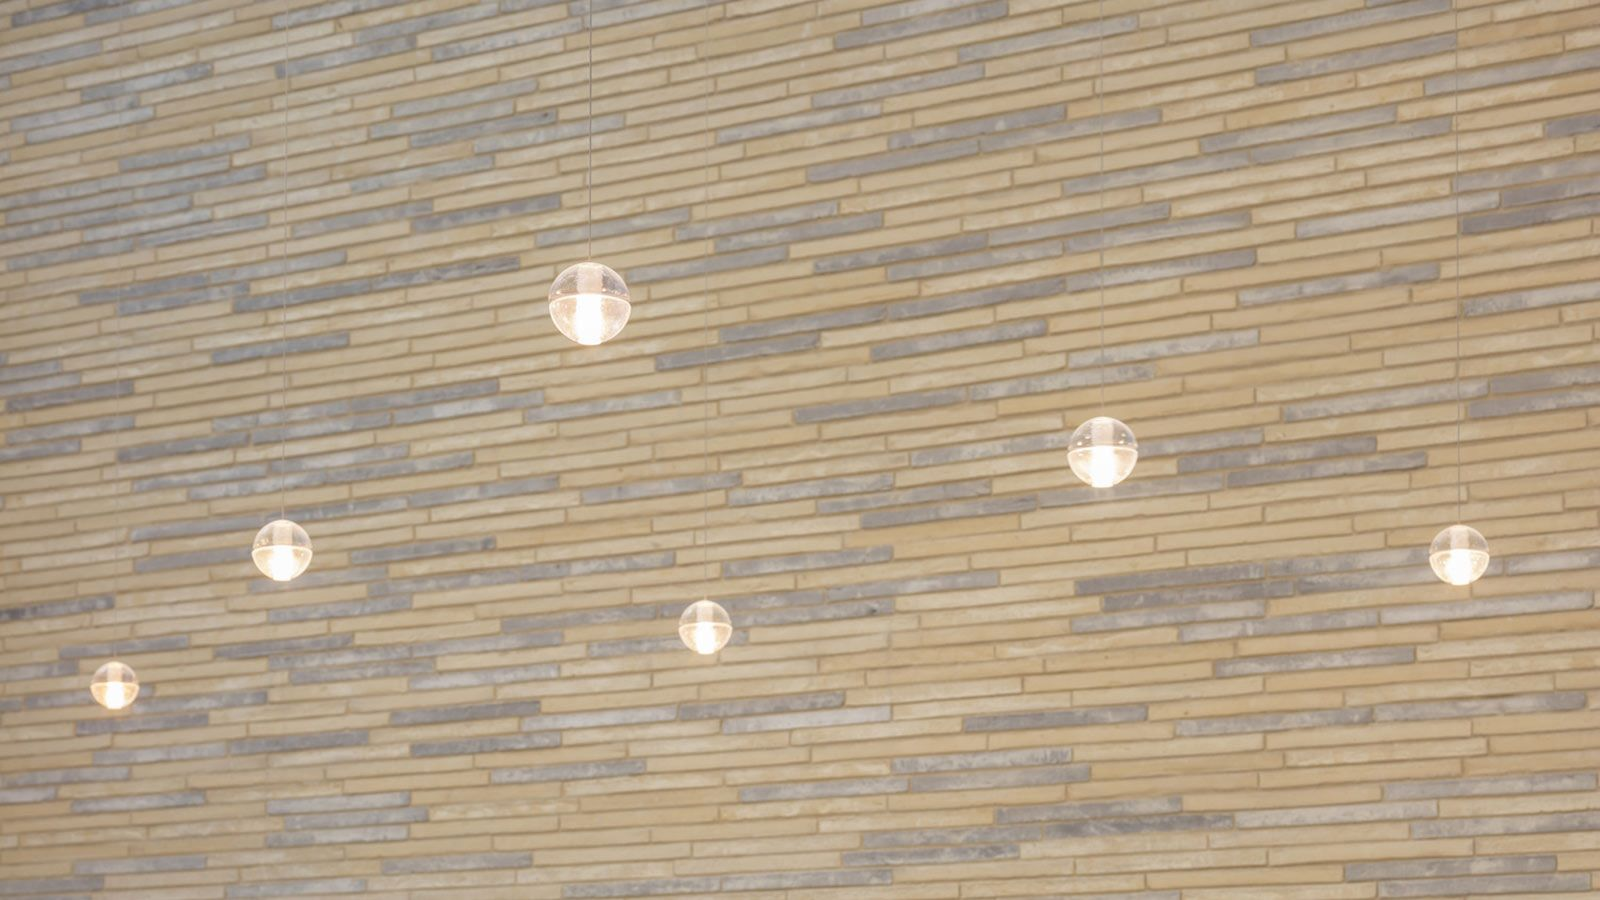 Office Hanging Lights, W5 – New Burlington Place Building - Mace Group